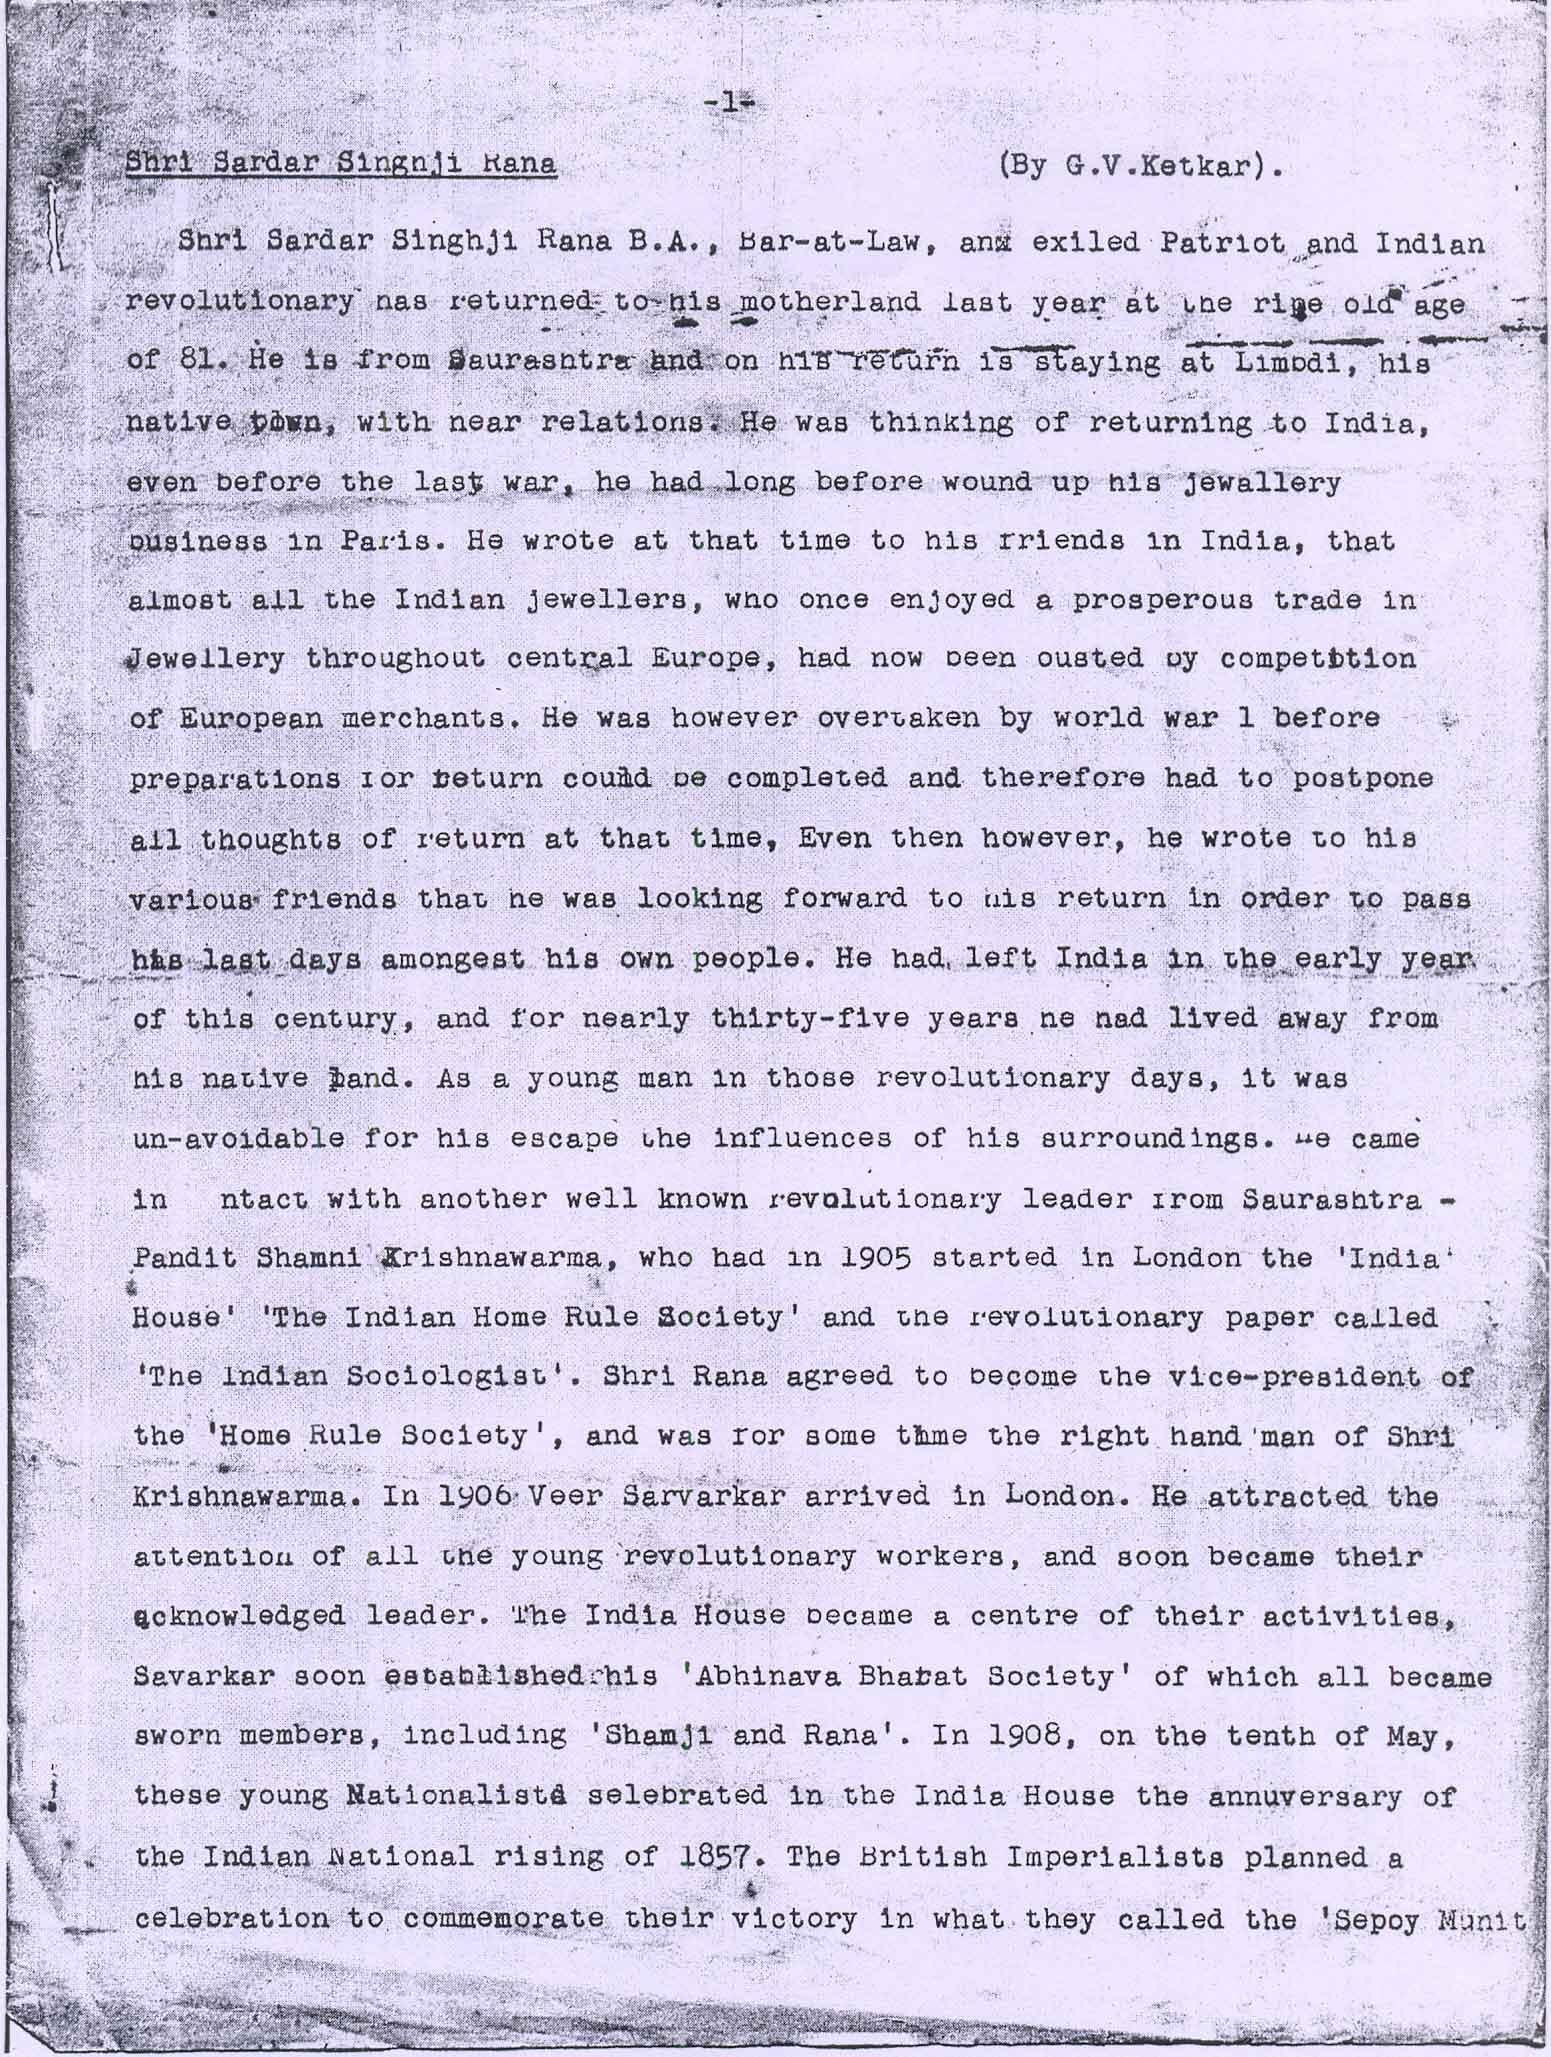 Ranaji-Life-and-Work-by-G-V-Ketkar